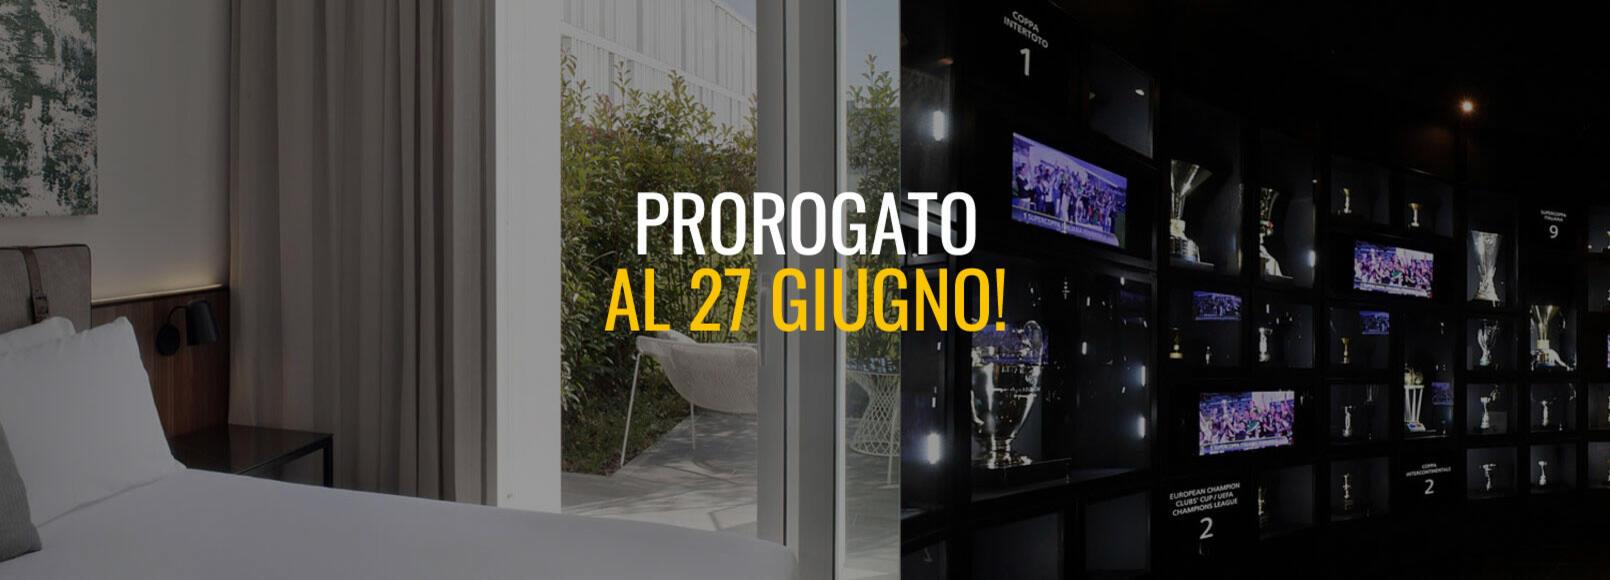 jhotel it regalo-fine-anno-scolastico-juventus 001